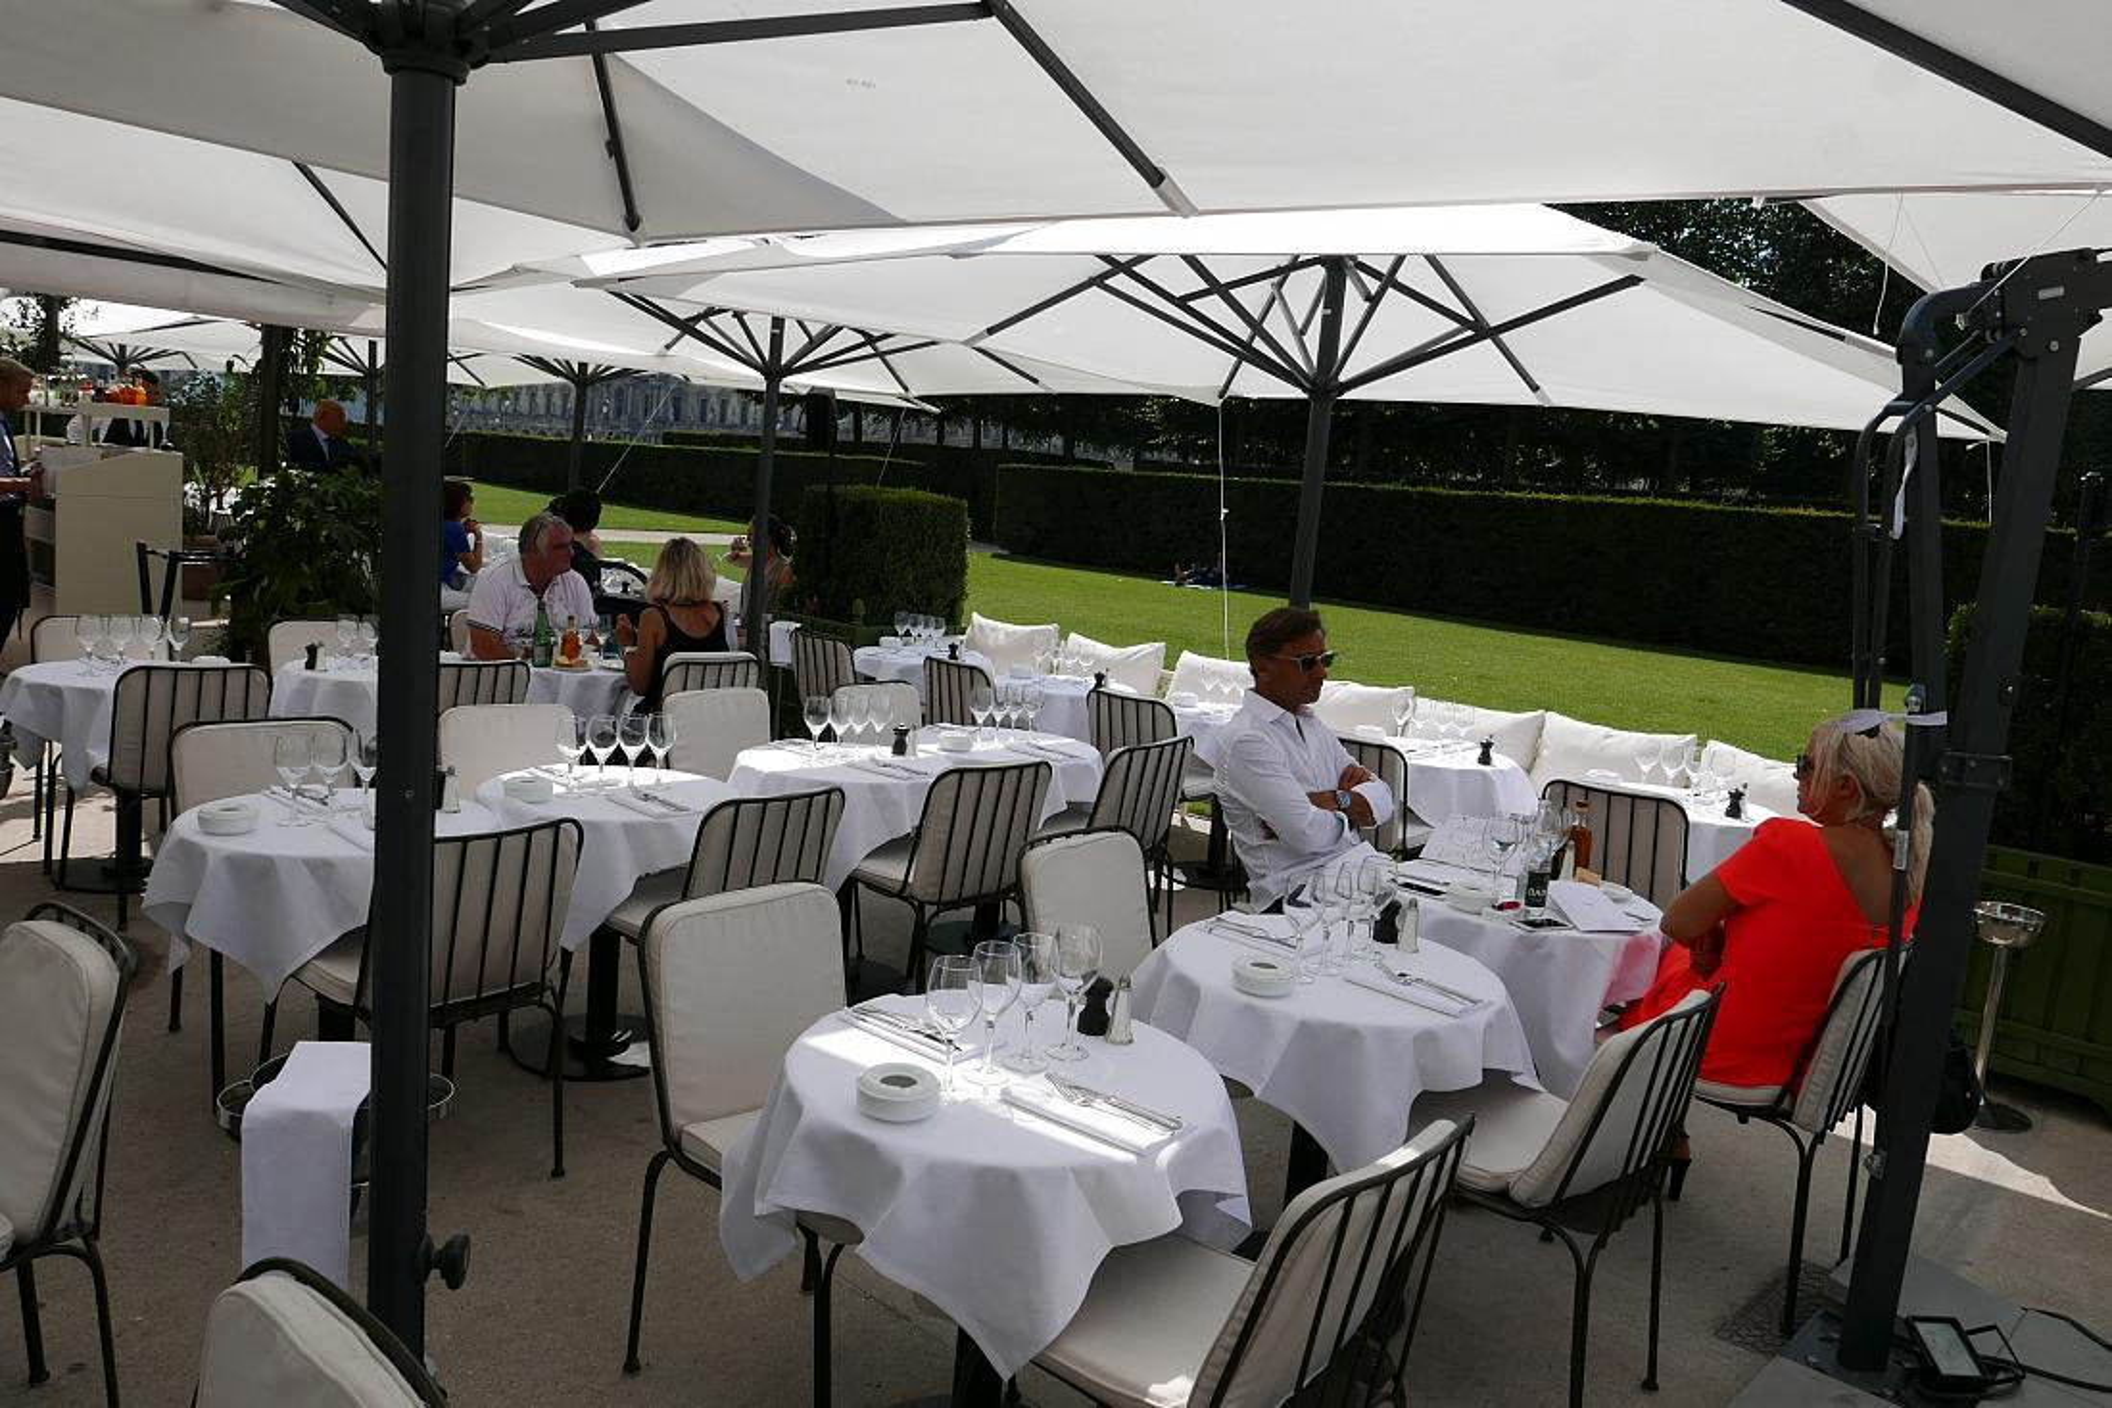 En terrasse - Restaurant en terrasse paris ...